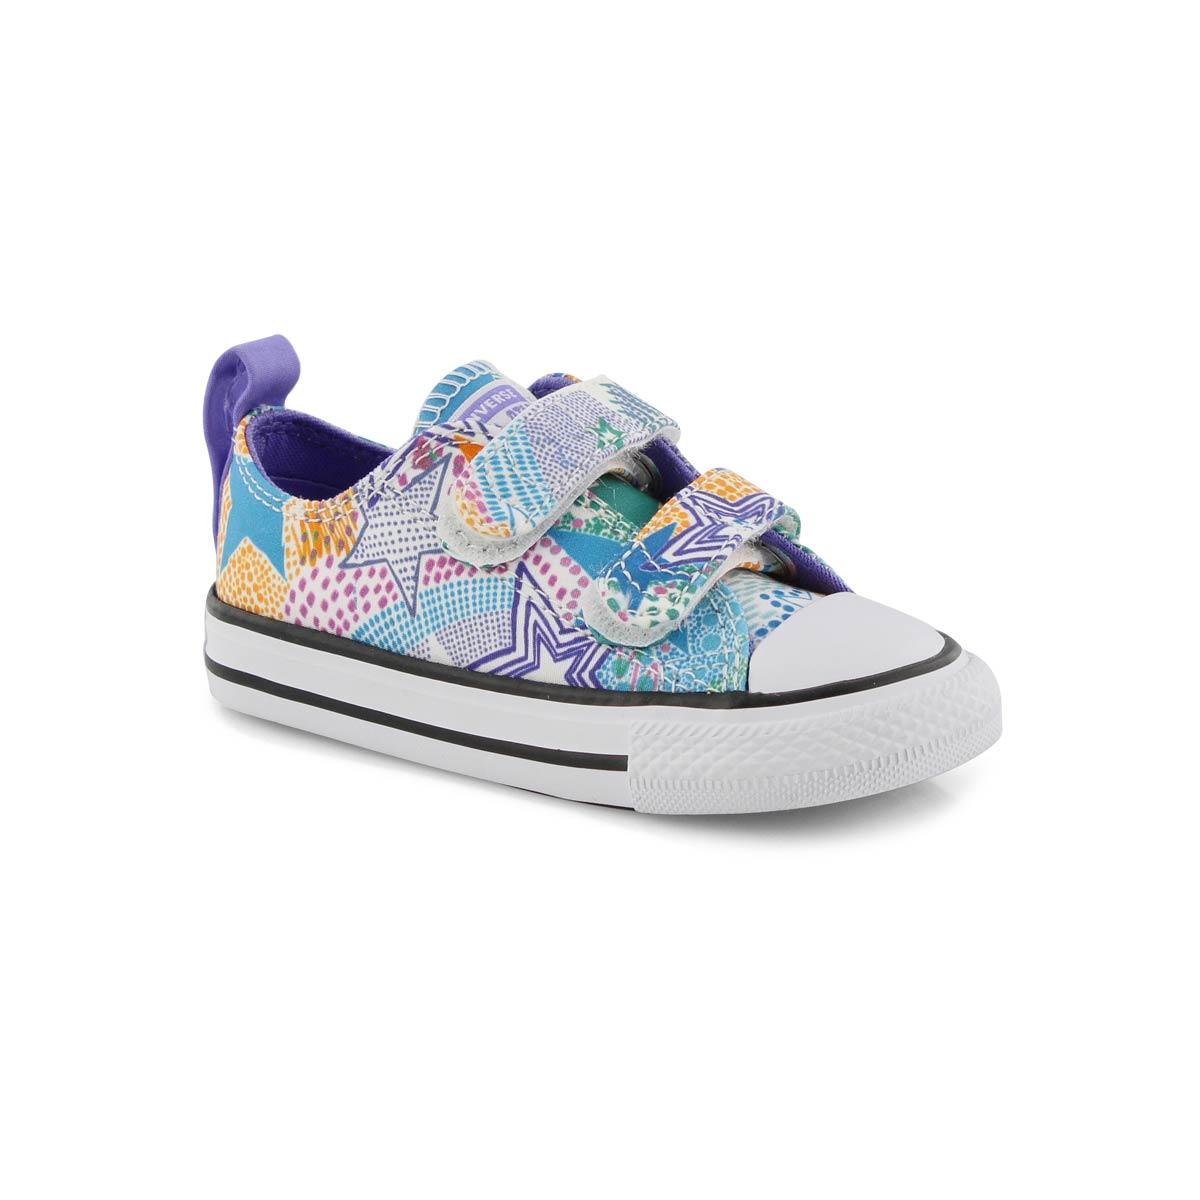 Infs V2 Ox wht/multi canvas sneaker